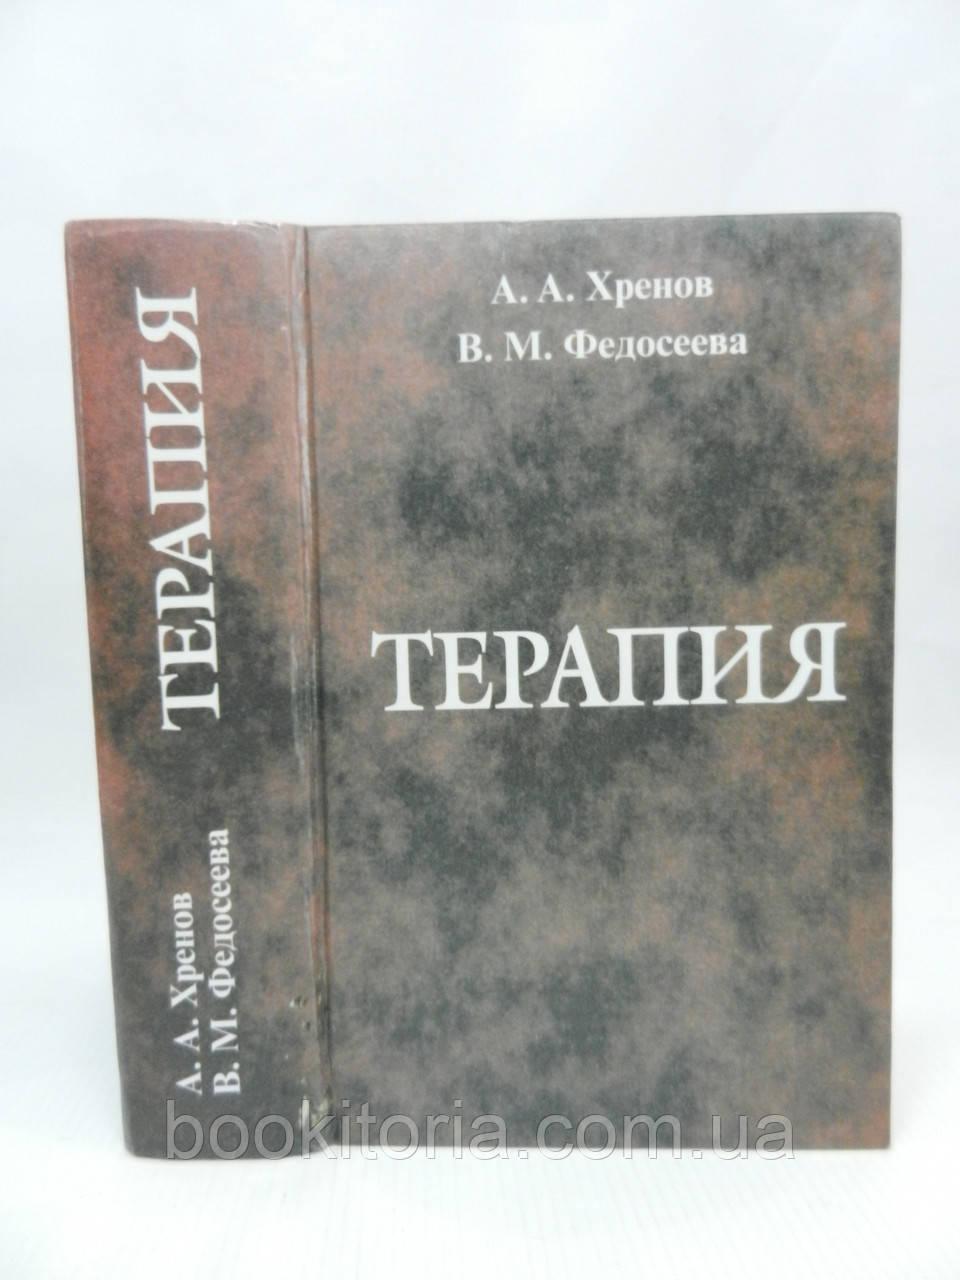 Хренов А.А., Федосеева В.М. Терапия (б/у).